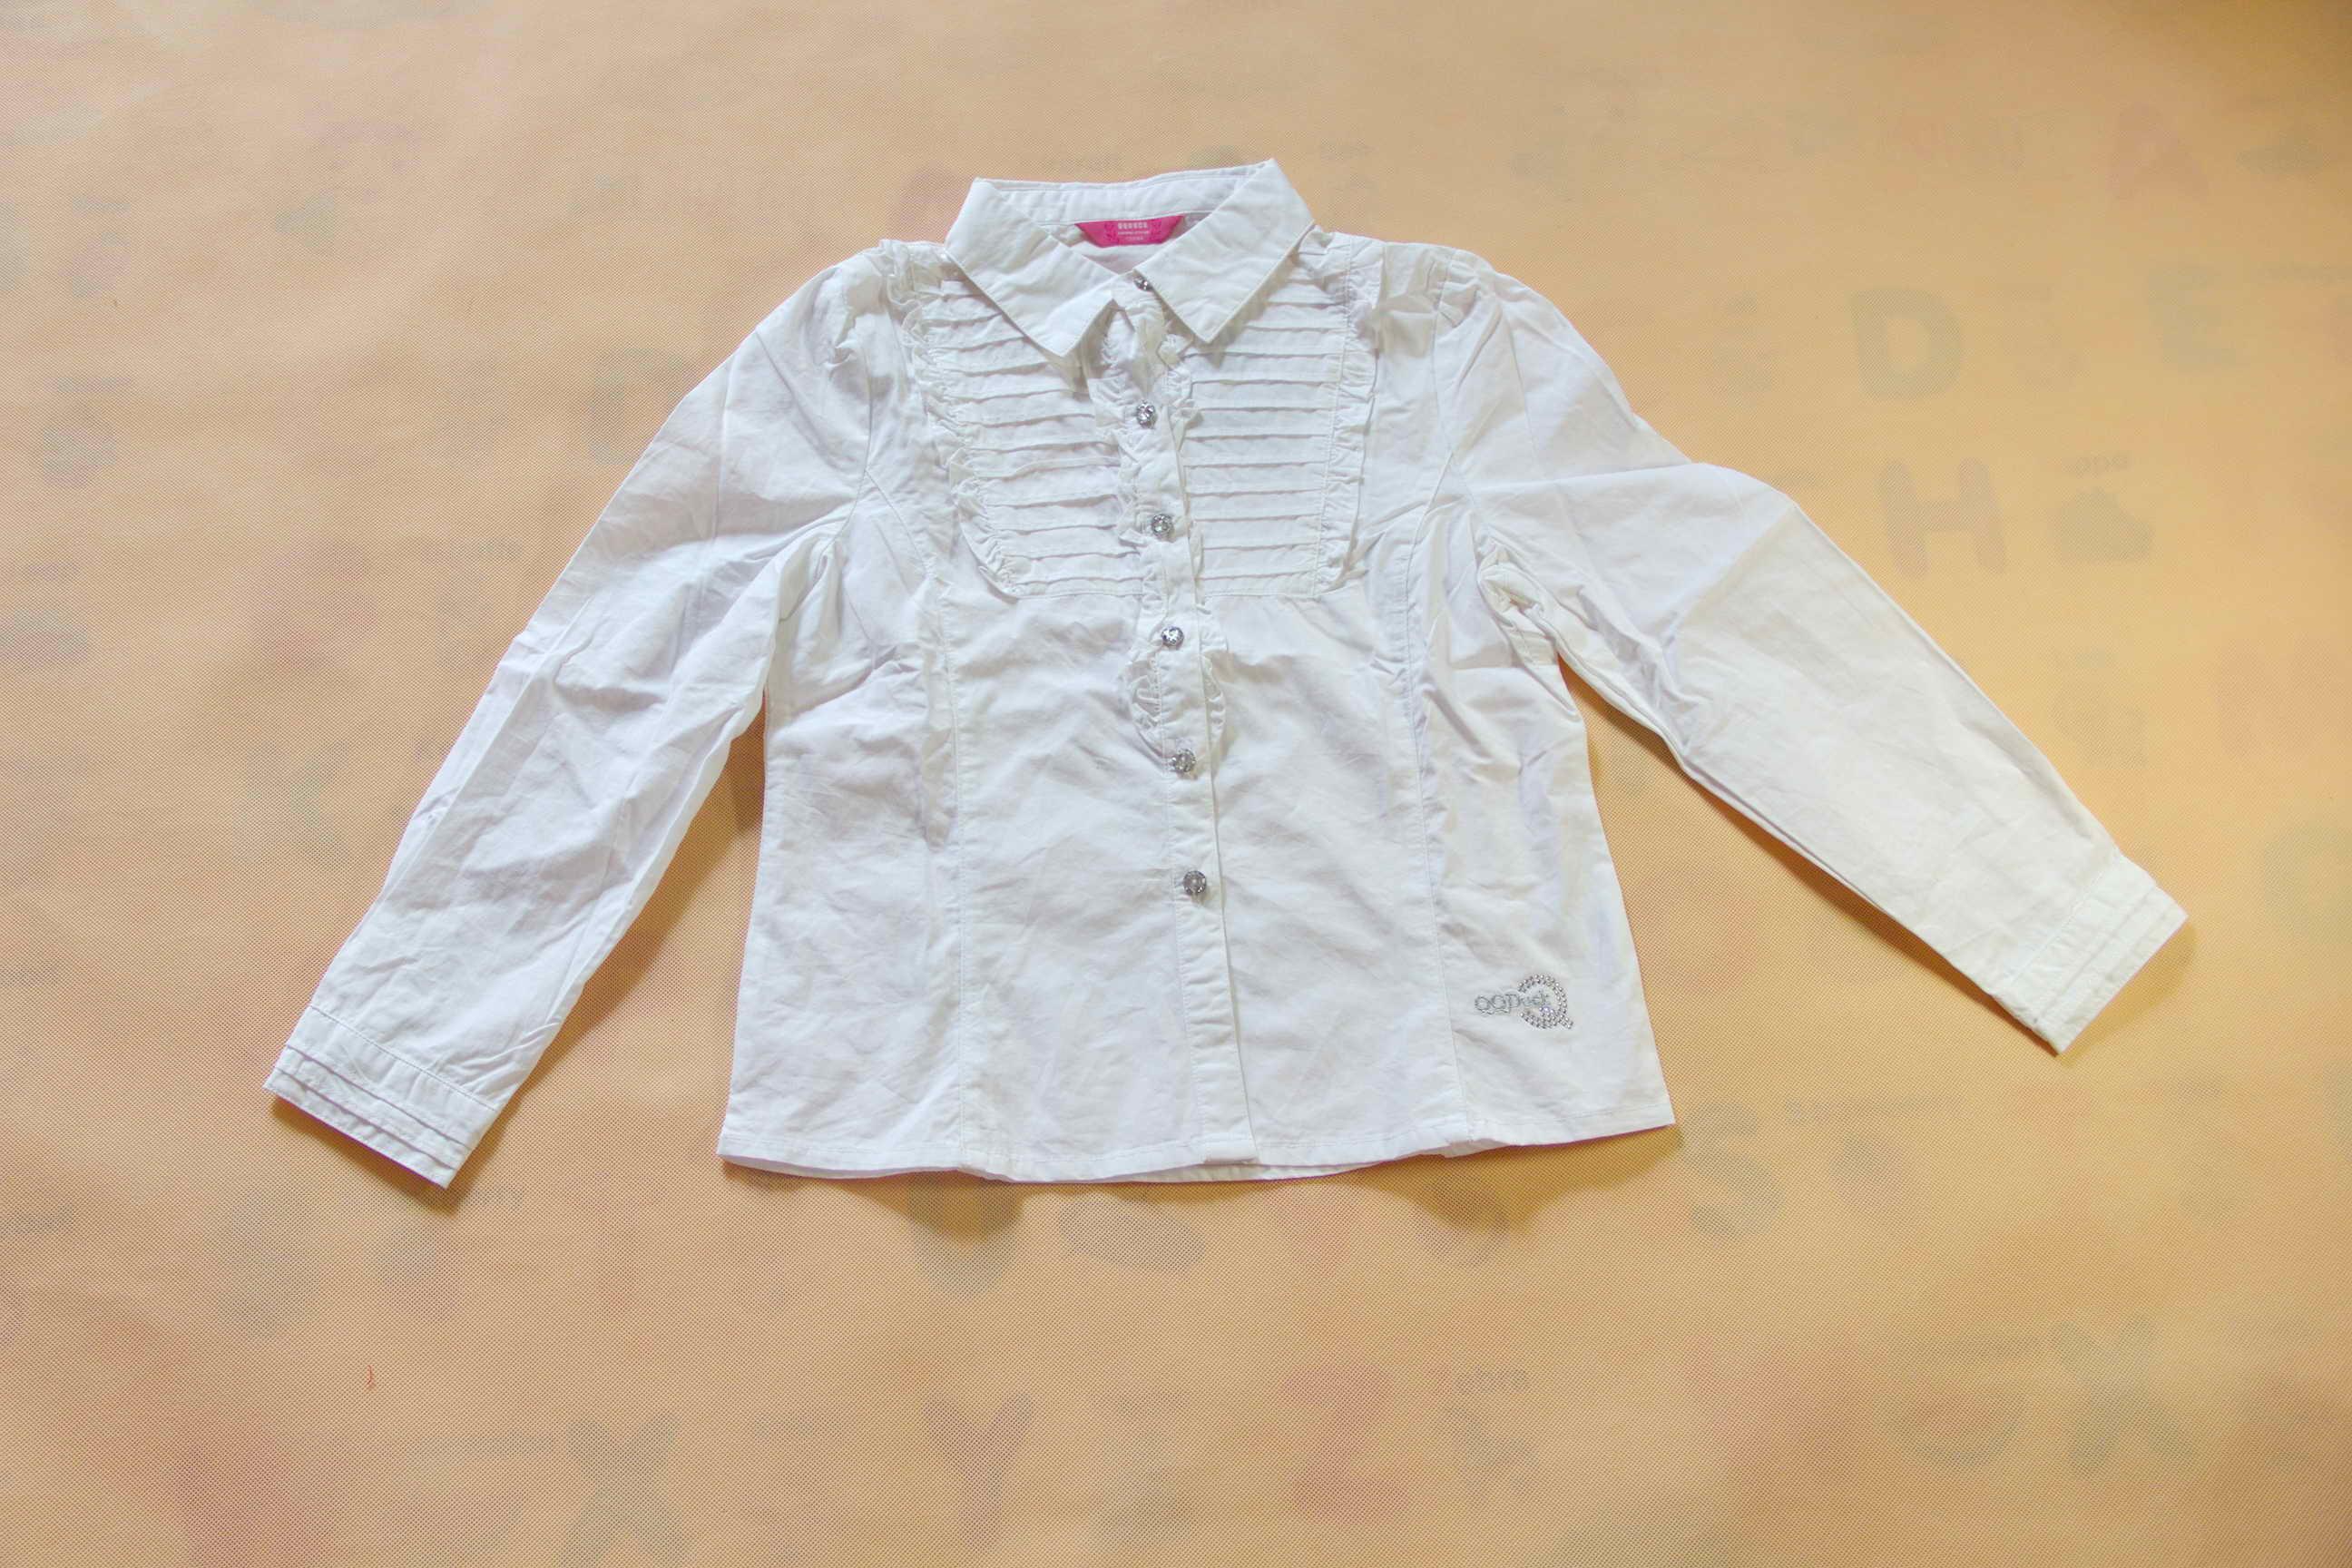 Рубашка детская Qq duck 201310141 2013 149 42